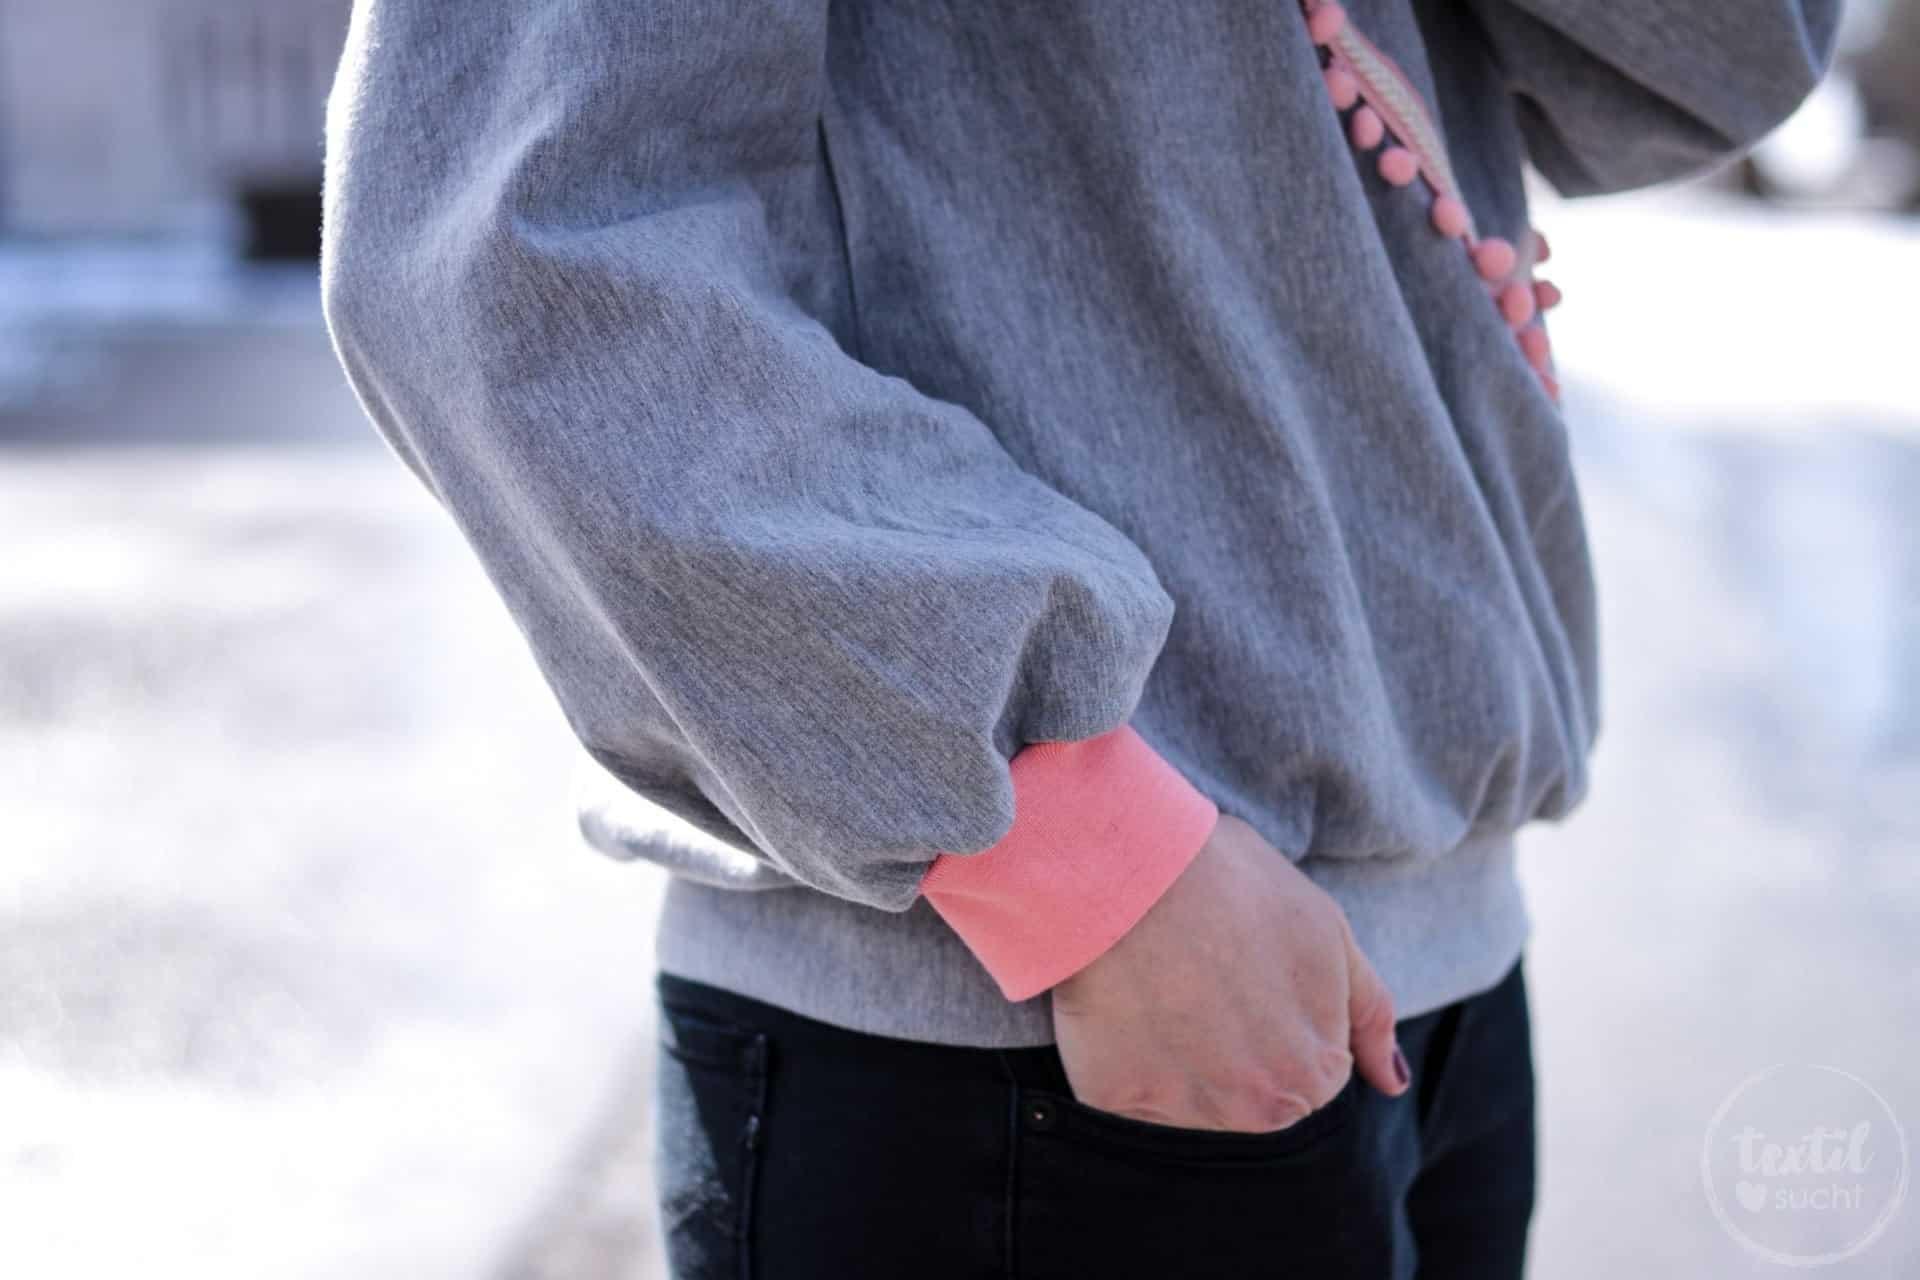 Neues Schnittmuster - Oversize Sweater India - Bild 3 | textilsucht.de